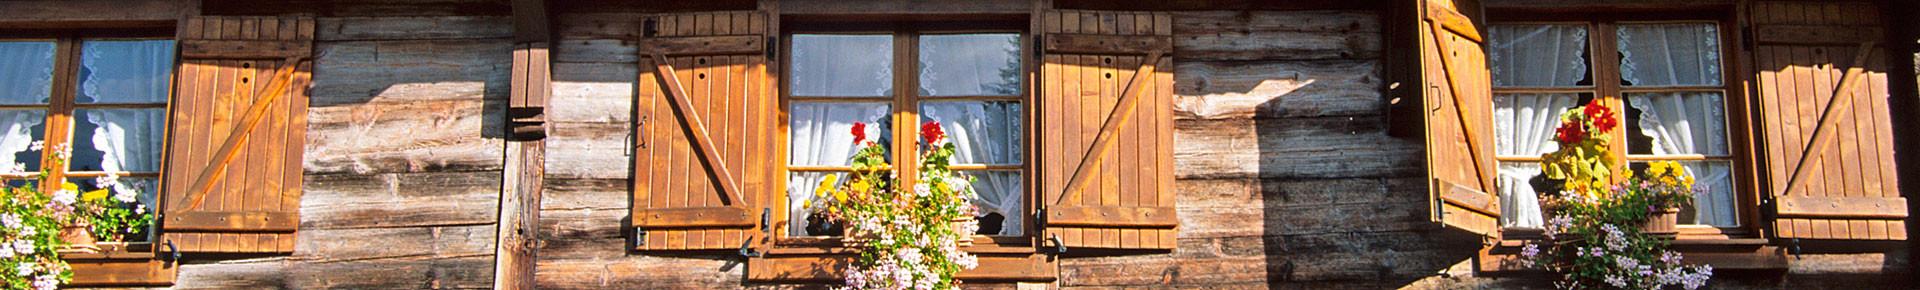 Hébergements d'été en Vallée d'Aulps